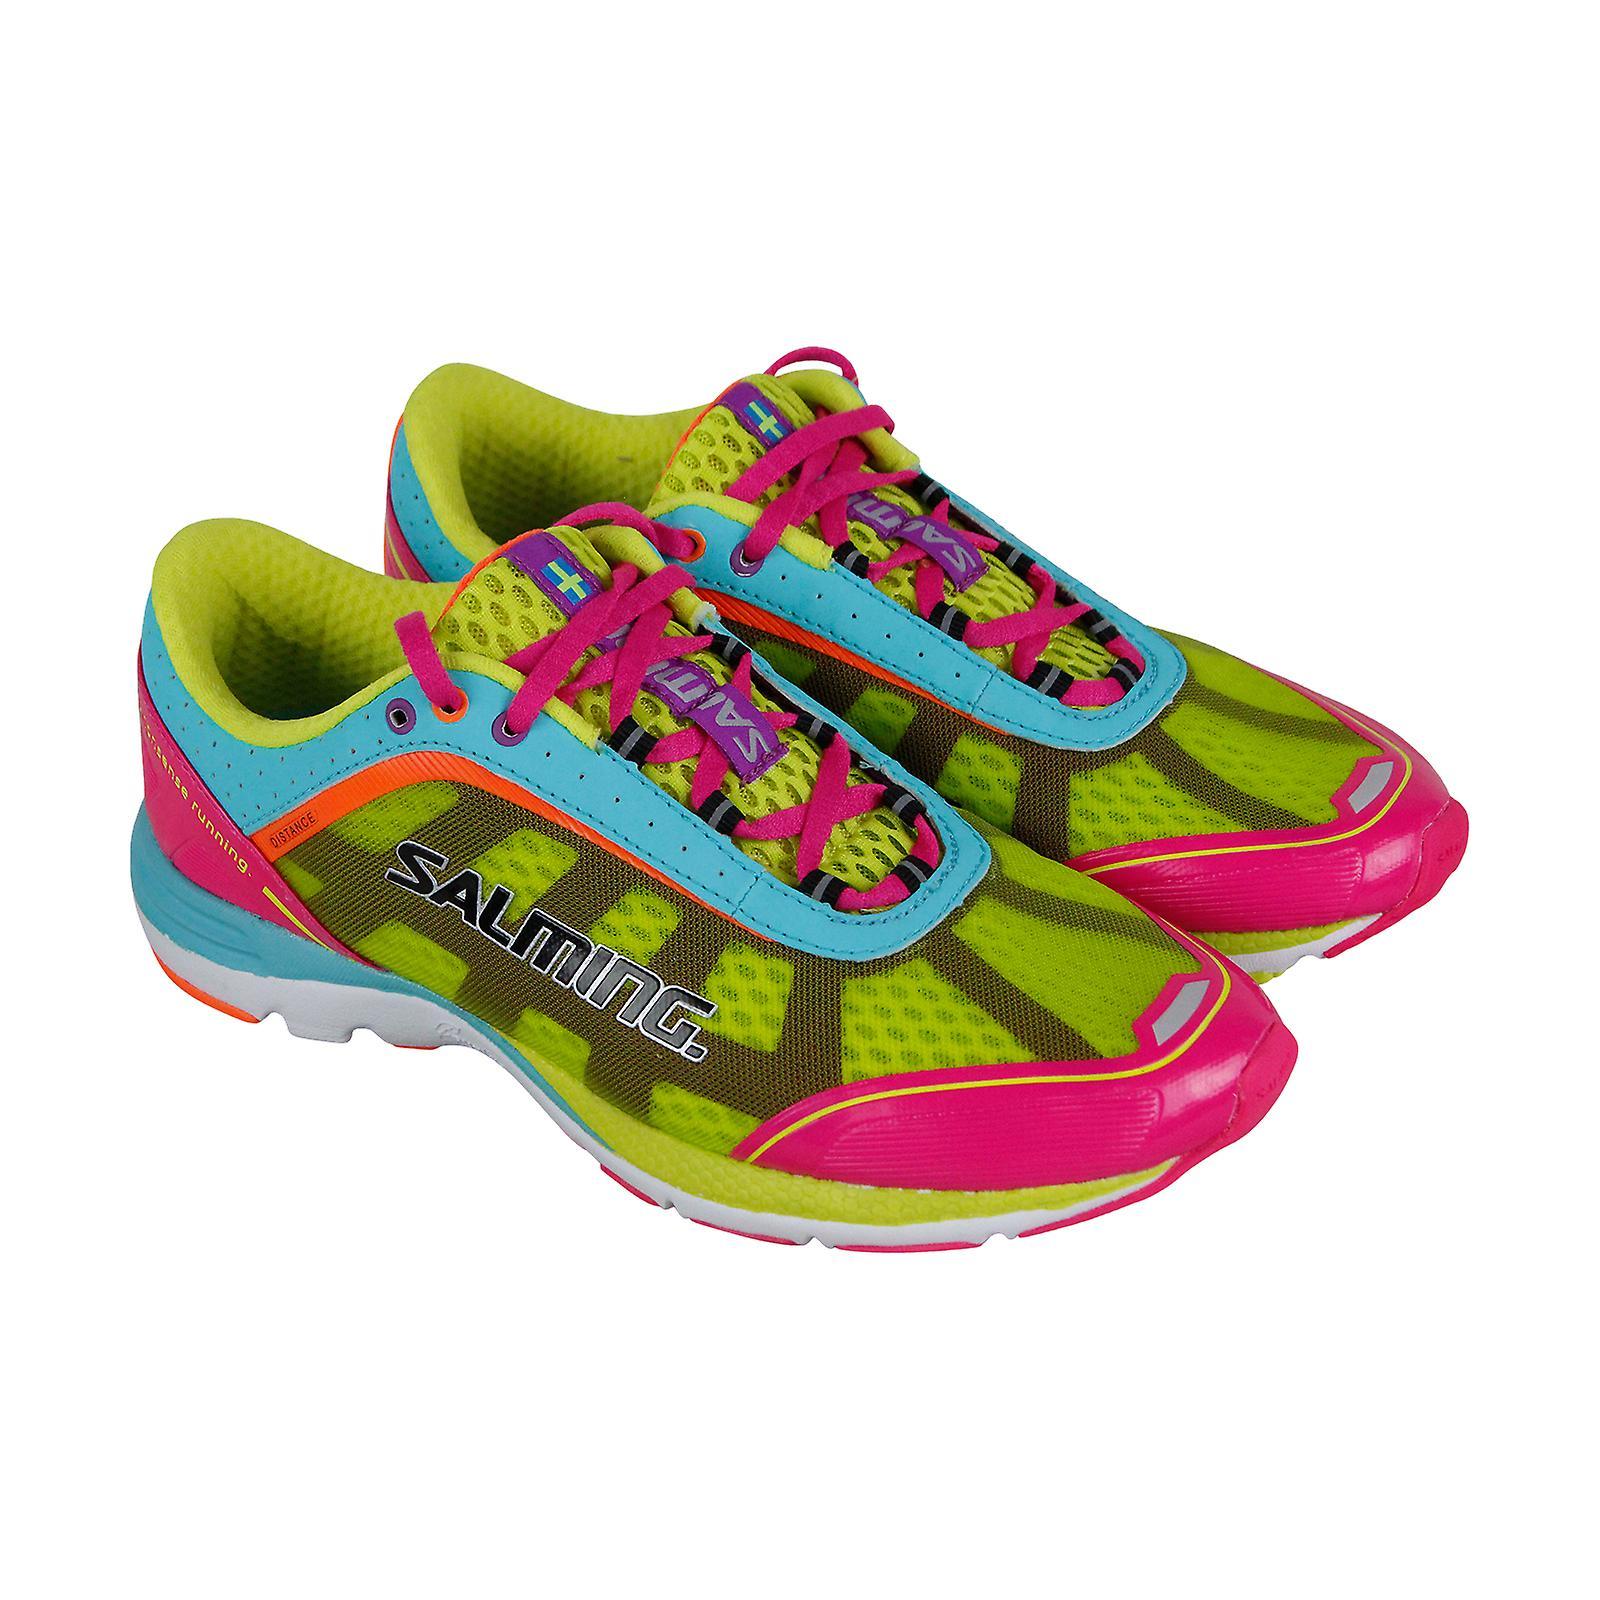 Salming Distance 3 vert femmes maille sport Lace Up chaussures de course